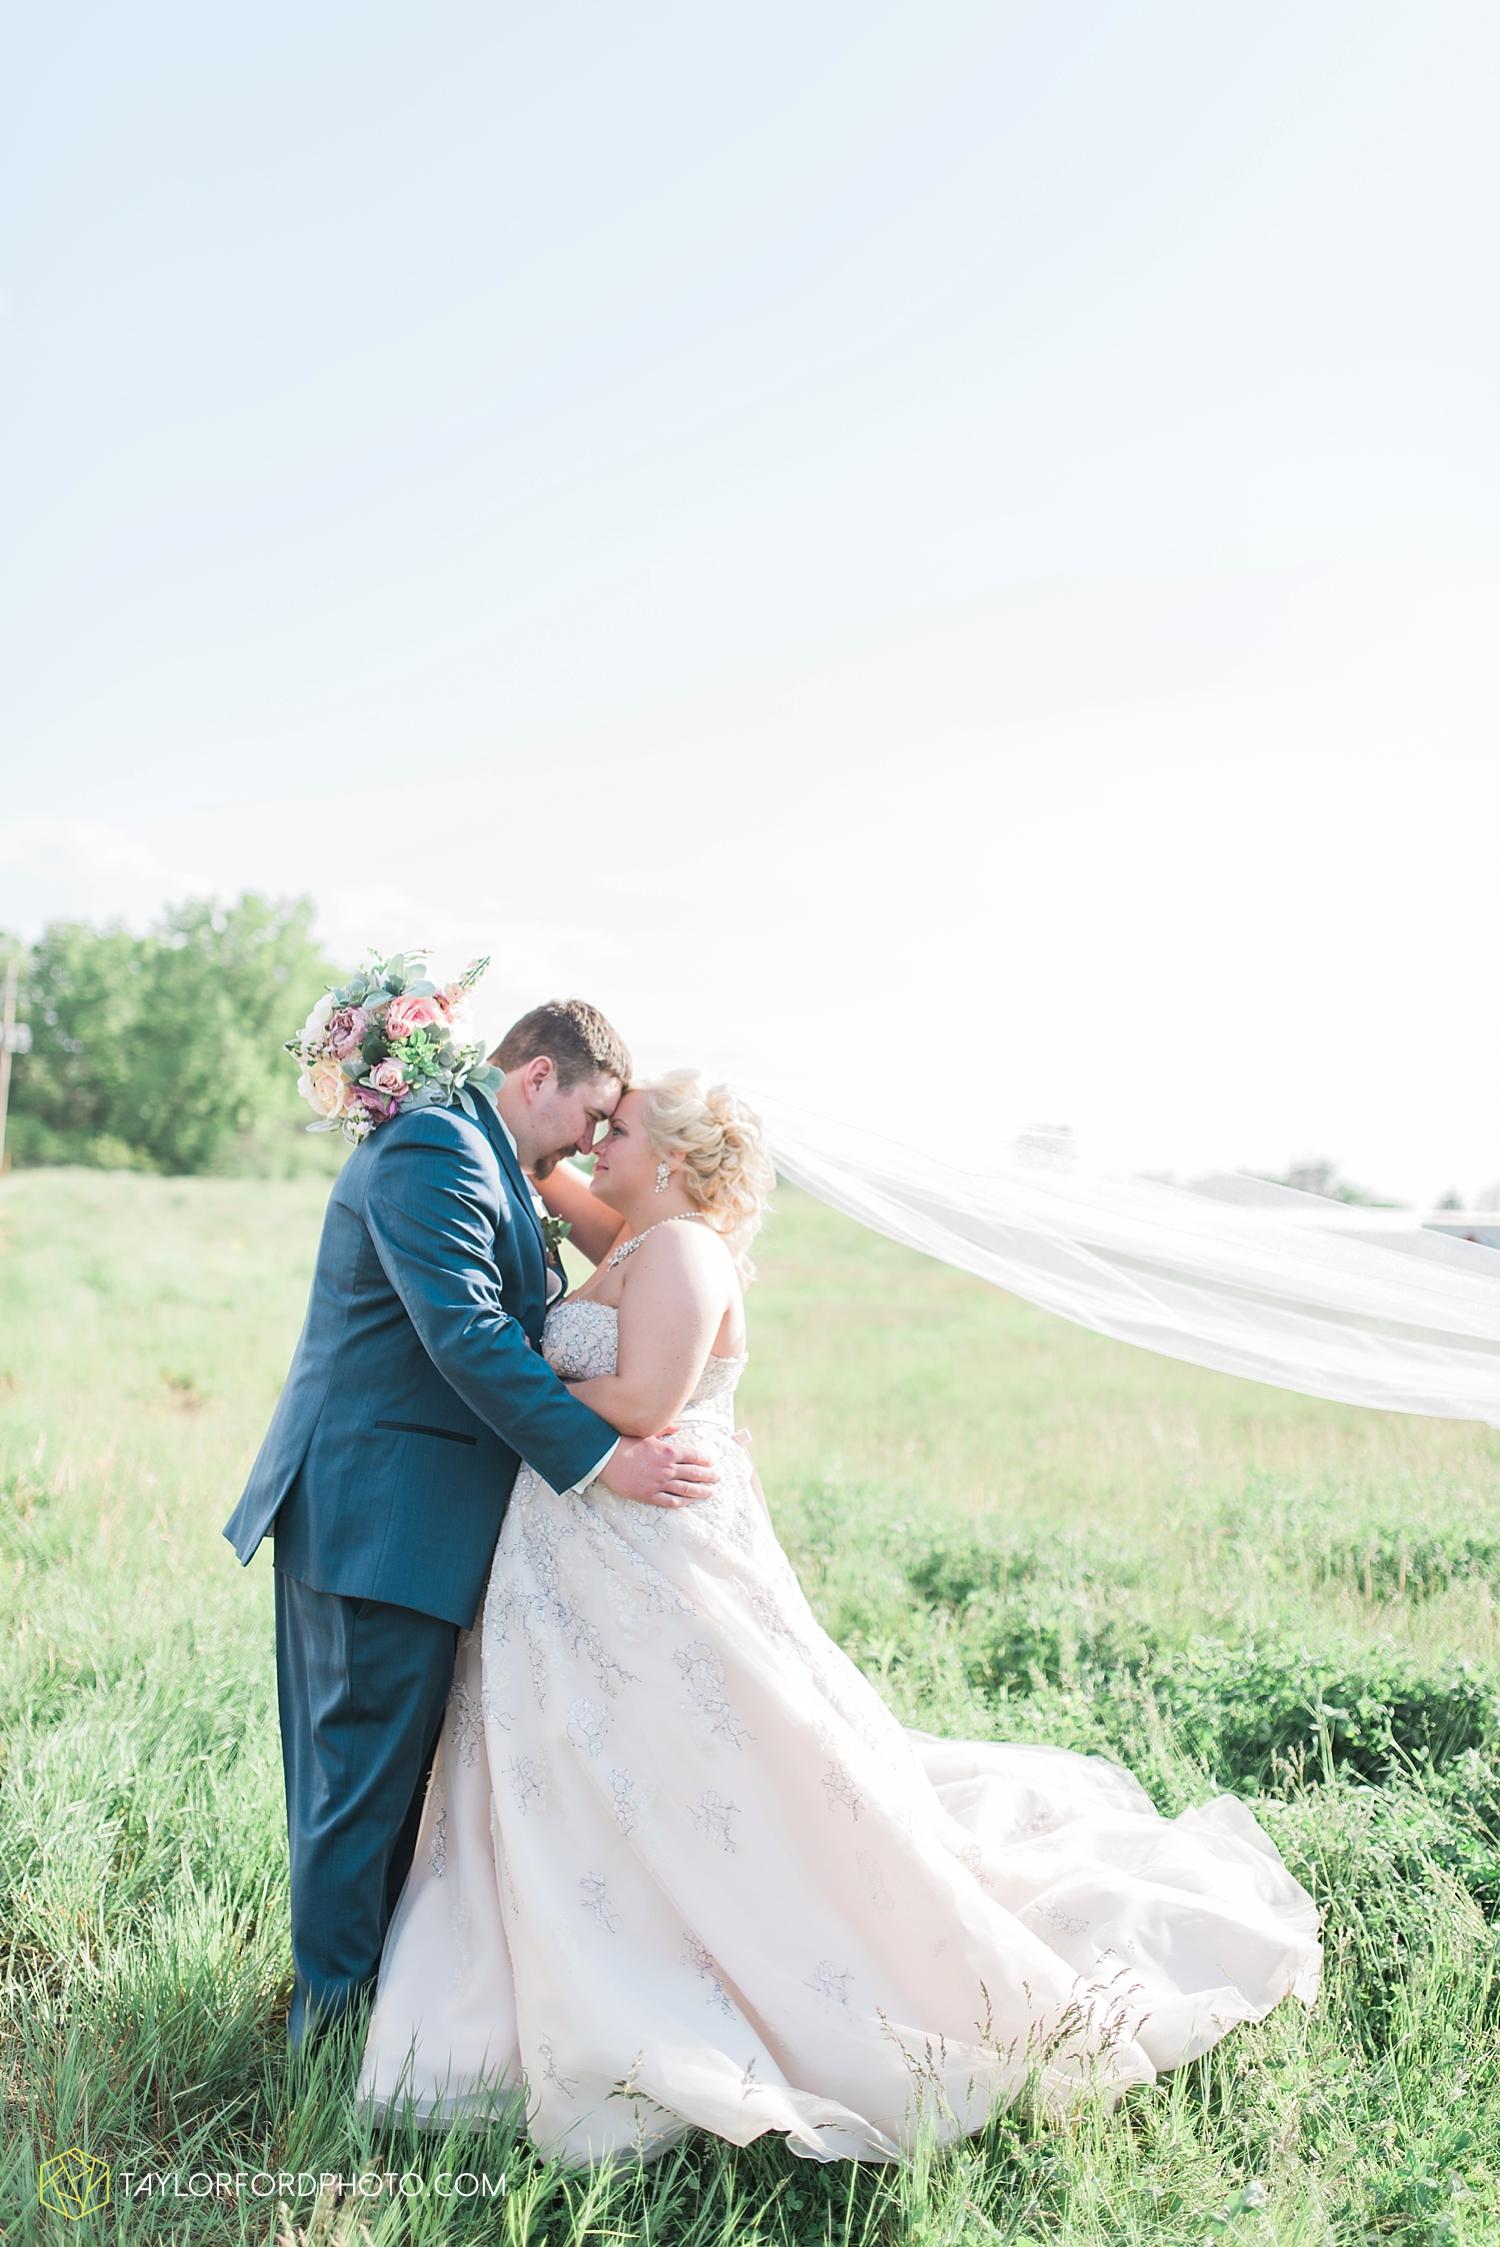 van_wert_ohio_wedding_photographer_taylor_ford_1295.jpg